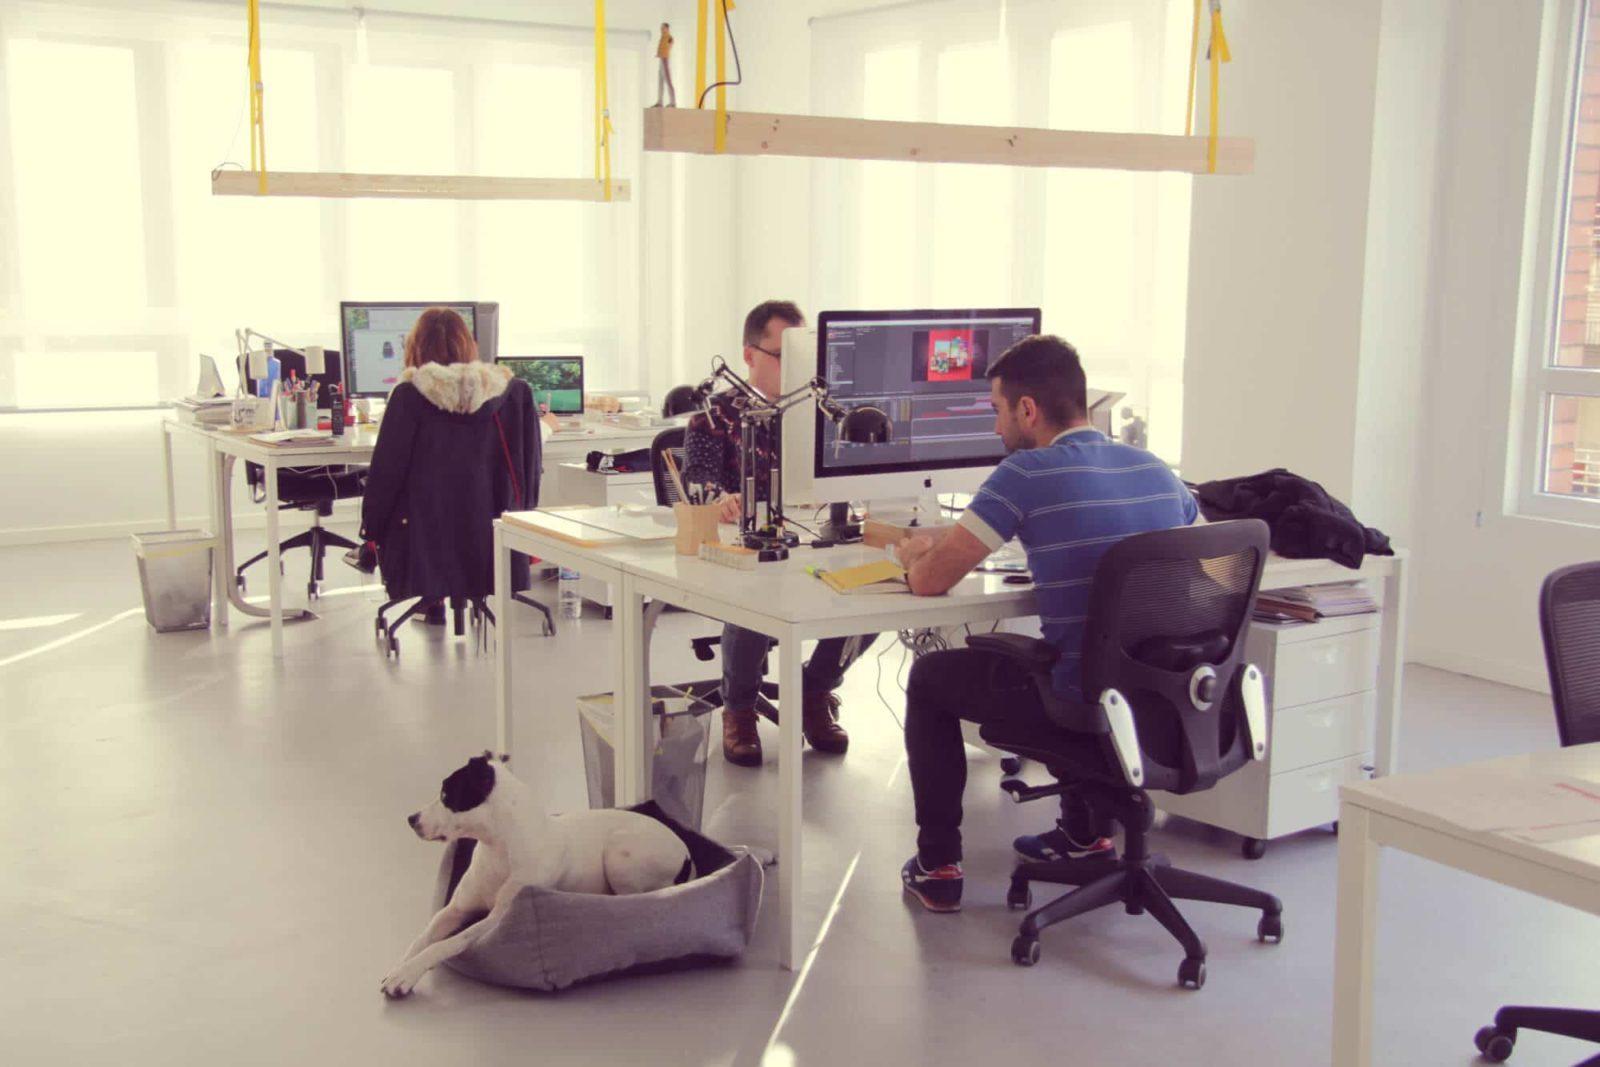 Sirope-trabajo-talleres-estudio-agencia-branding